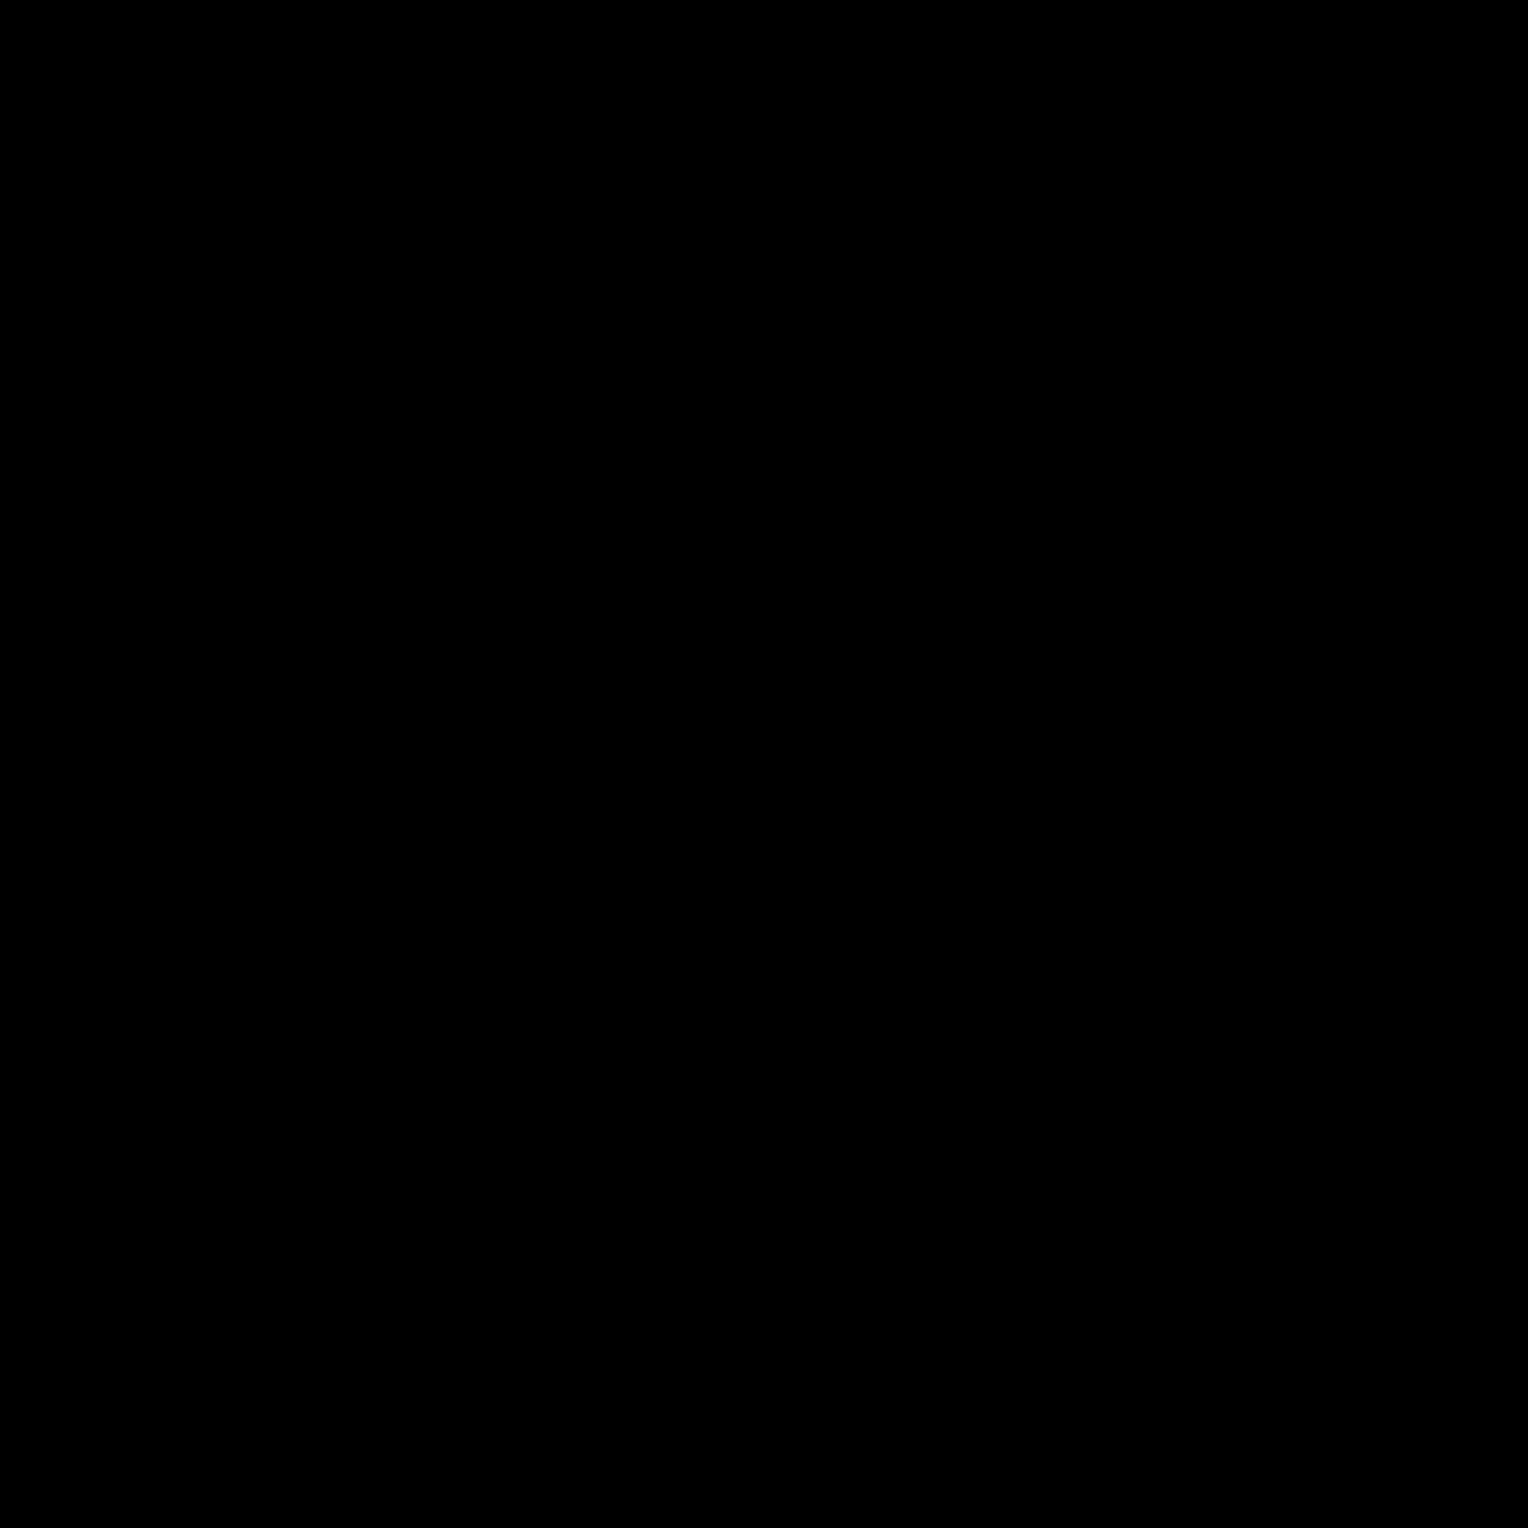 Tradogram 1516978586 logo